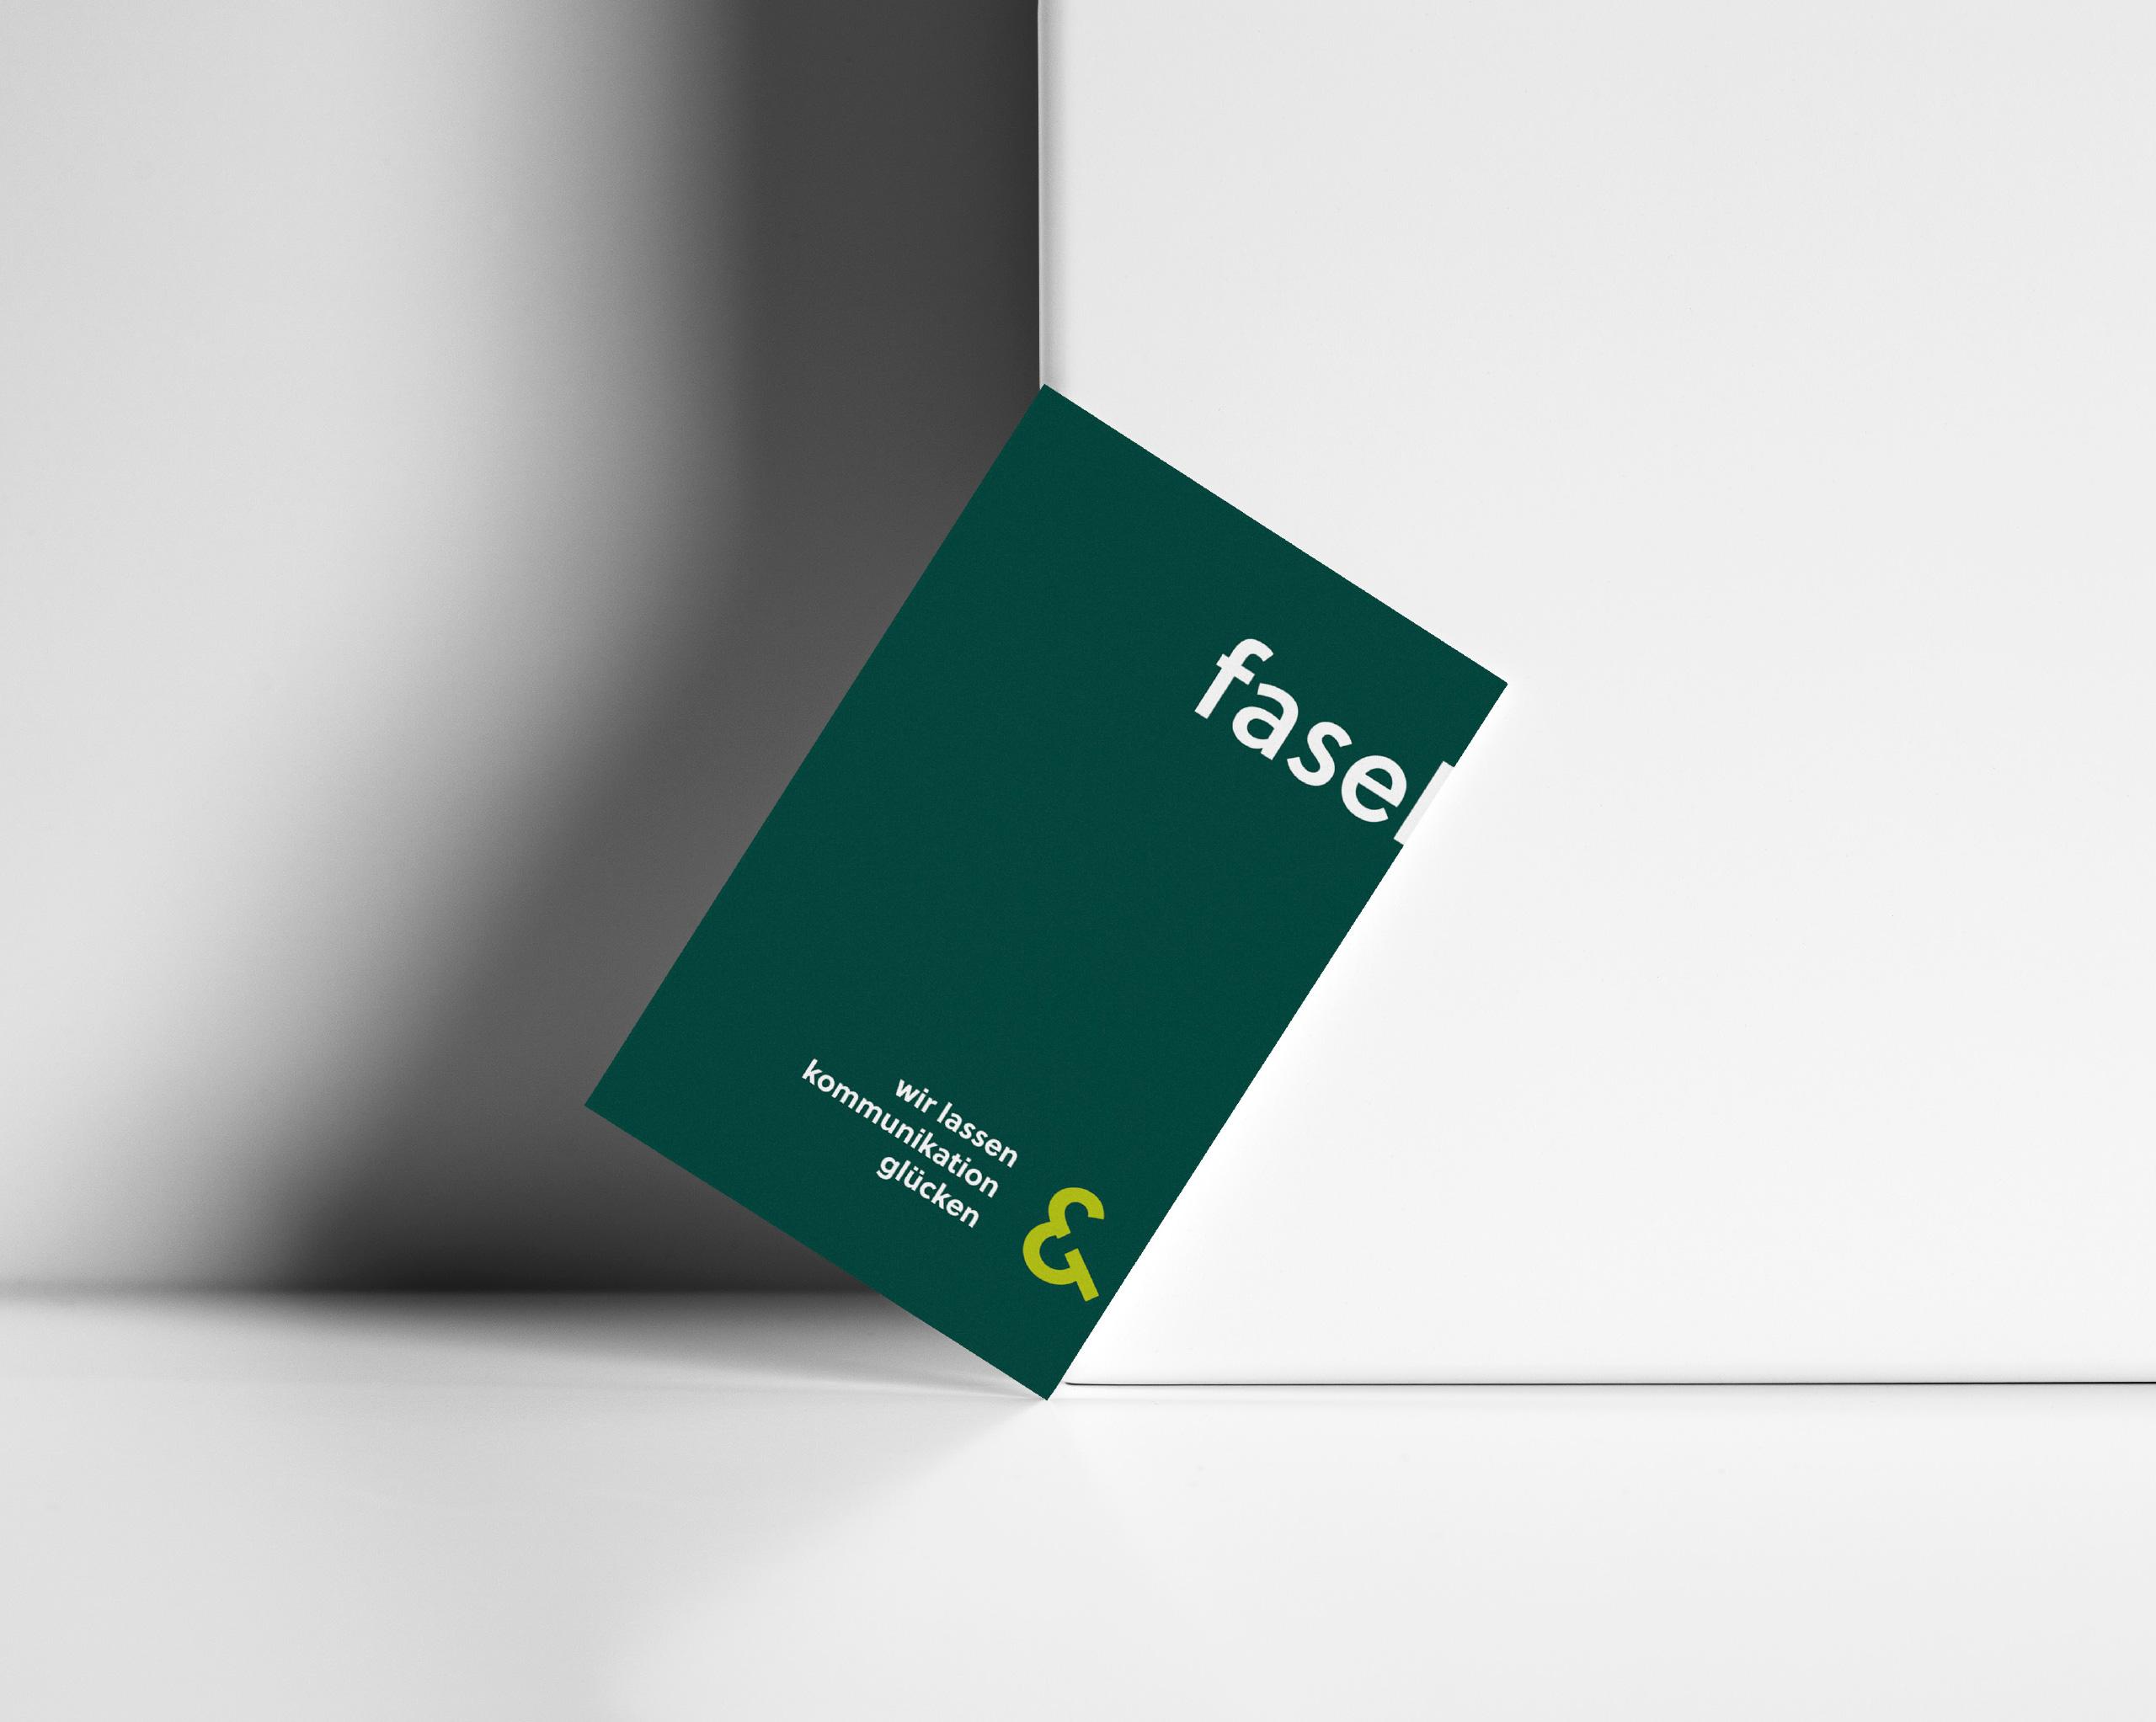 Bourdonné Design Fasel und Fasel Corporate Design